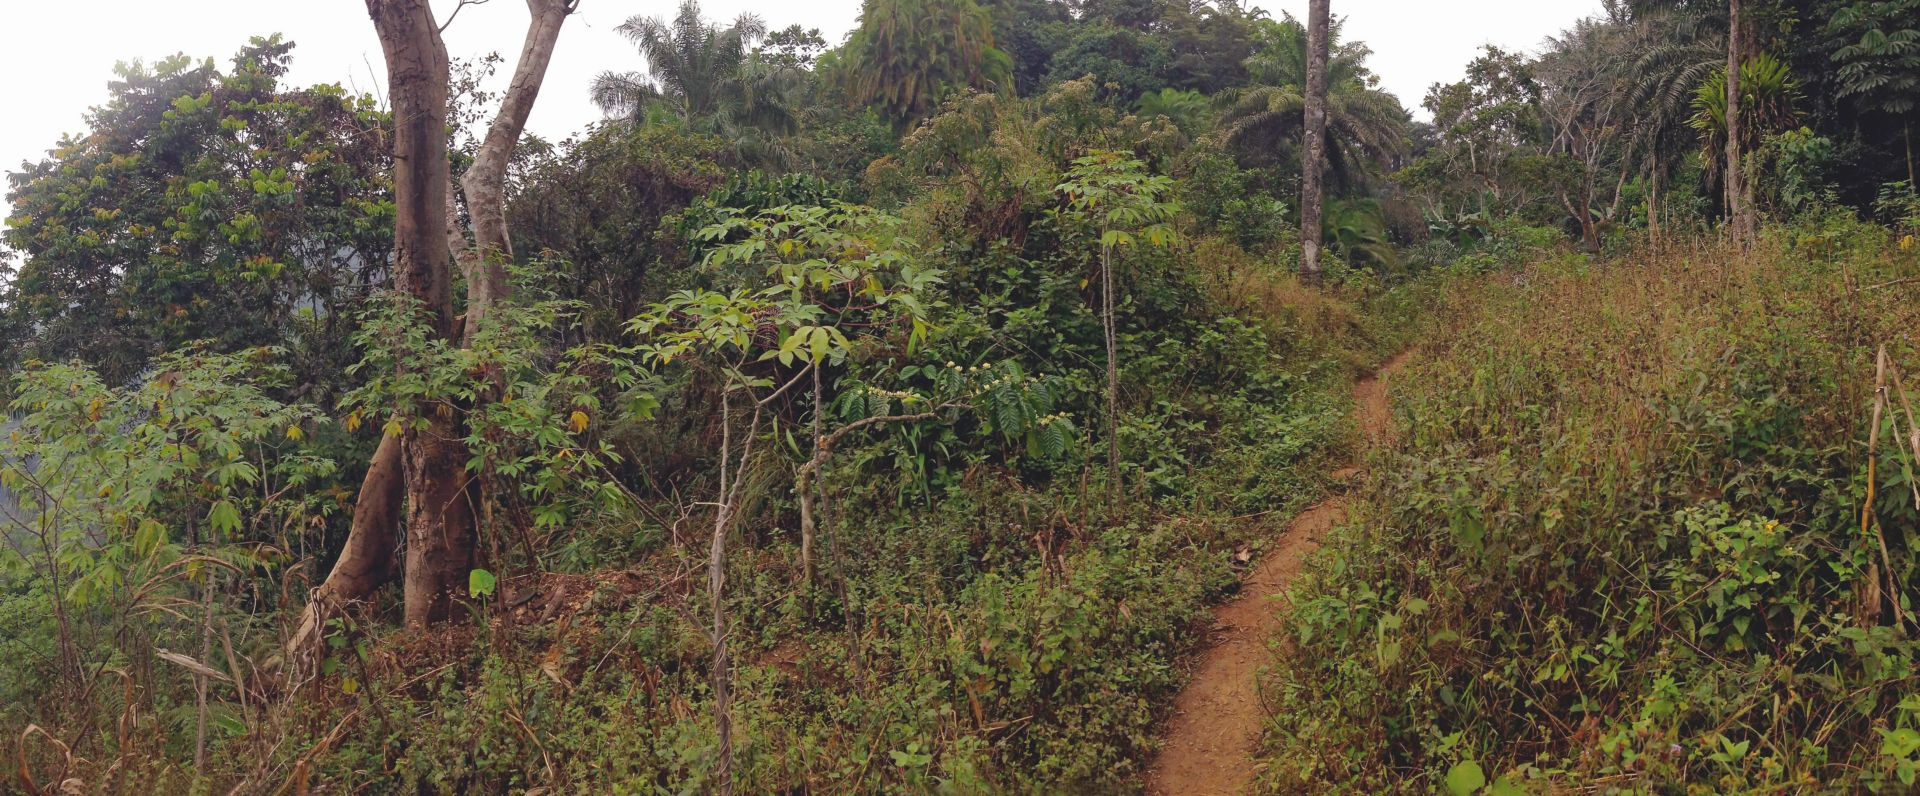 Kamerun11